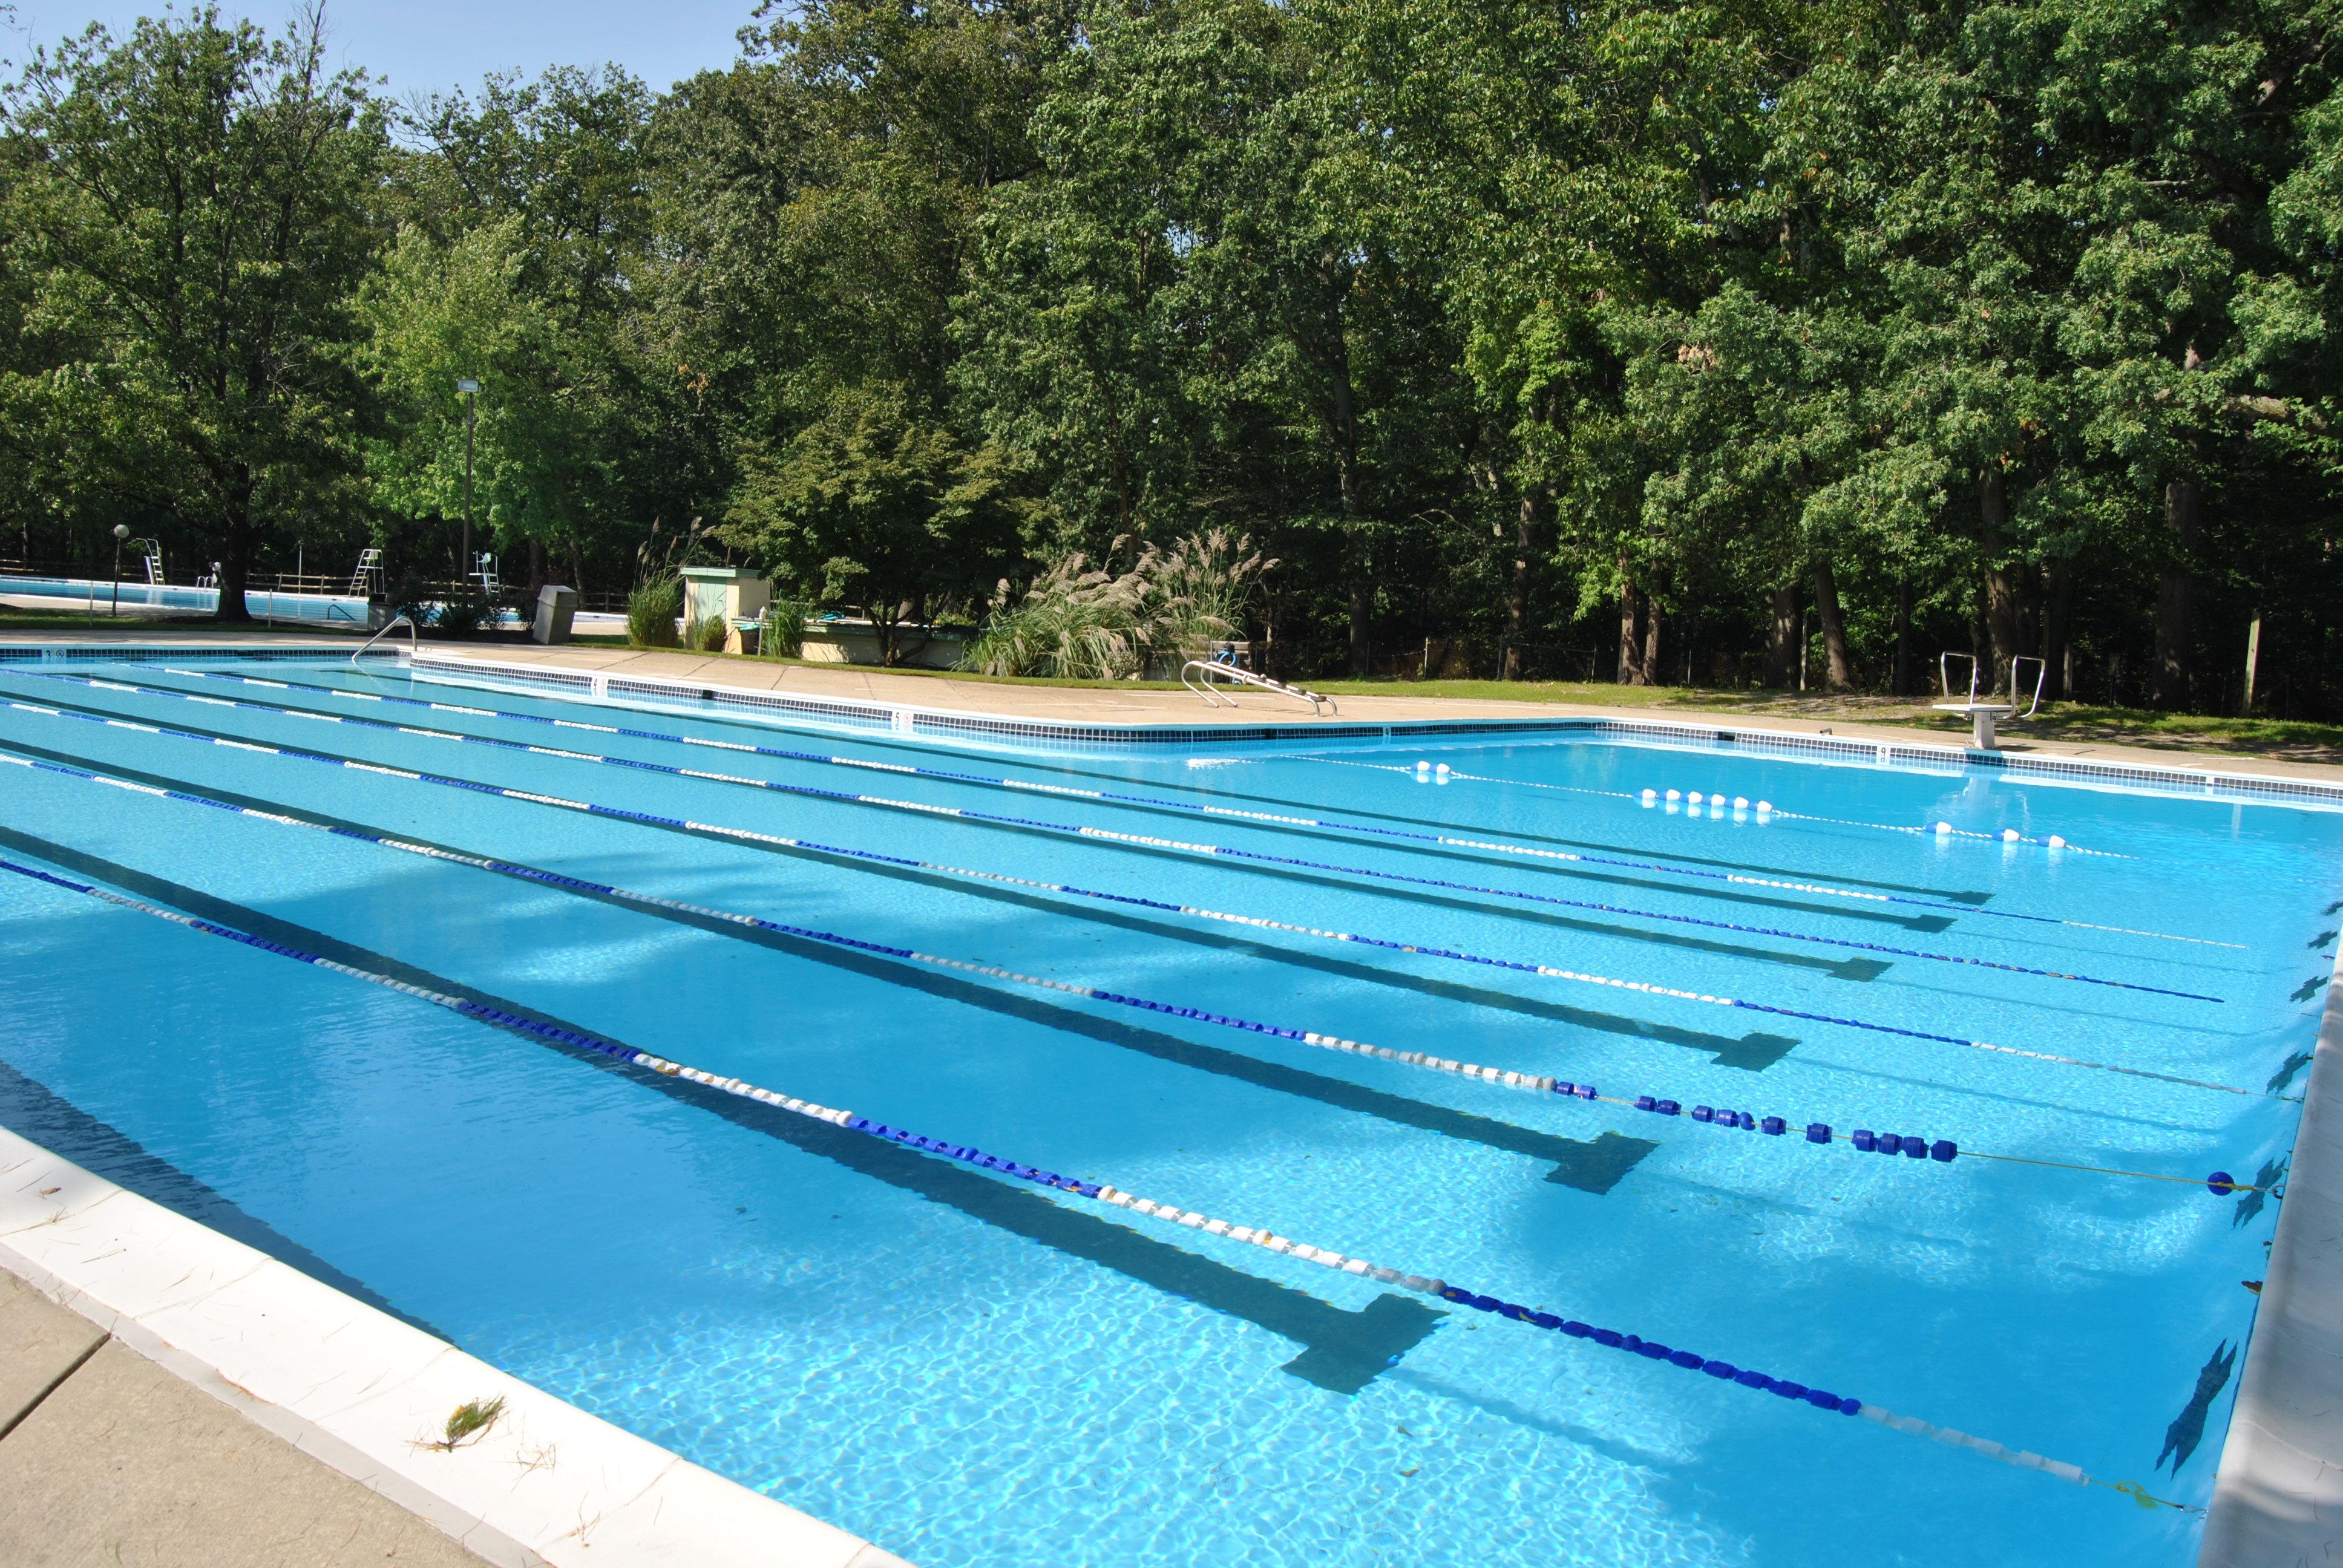 Ramblewood Swim Club image 16